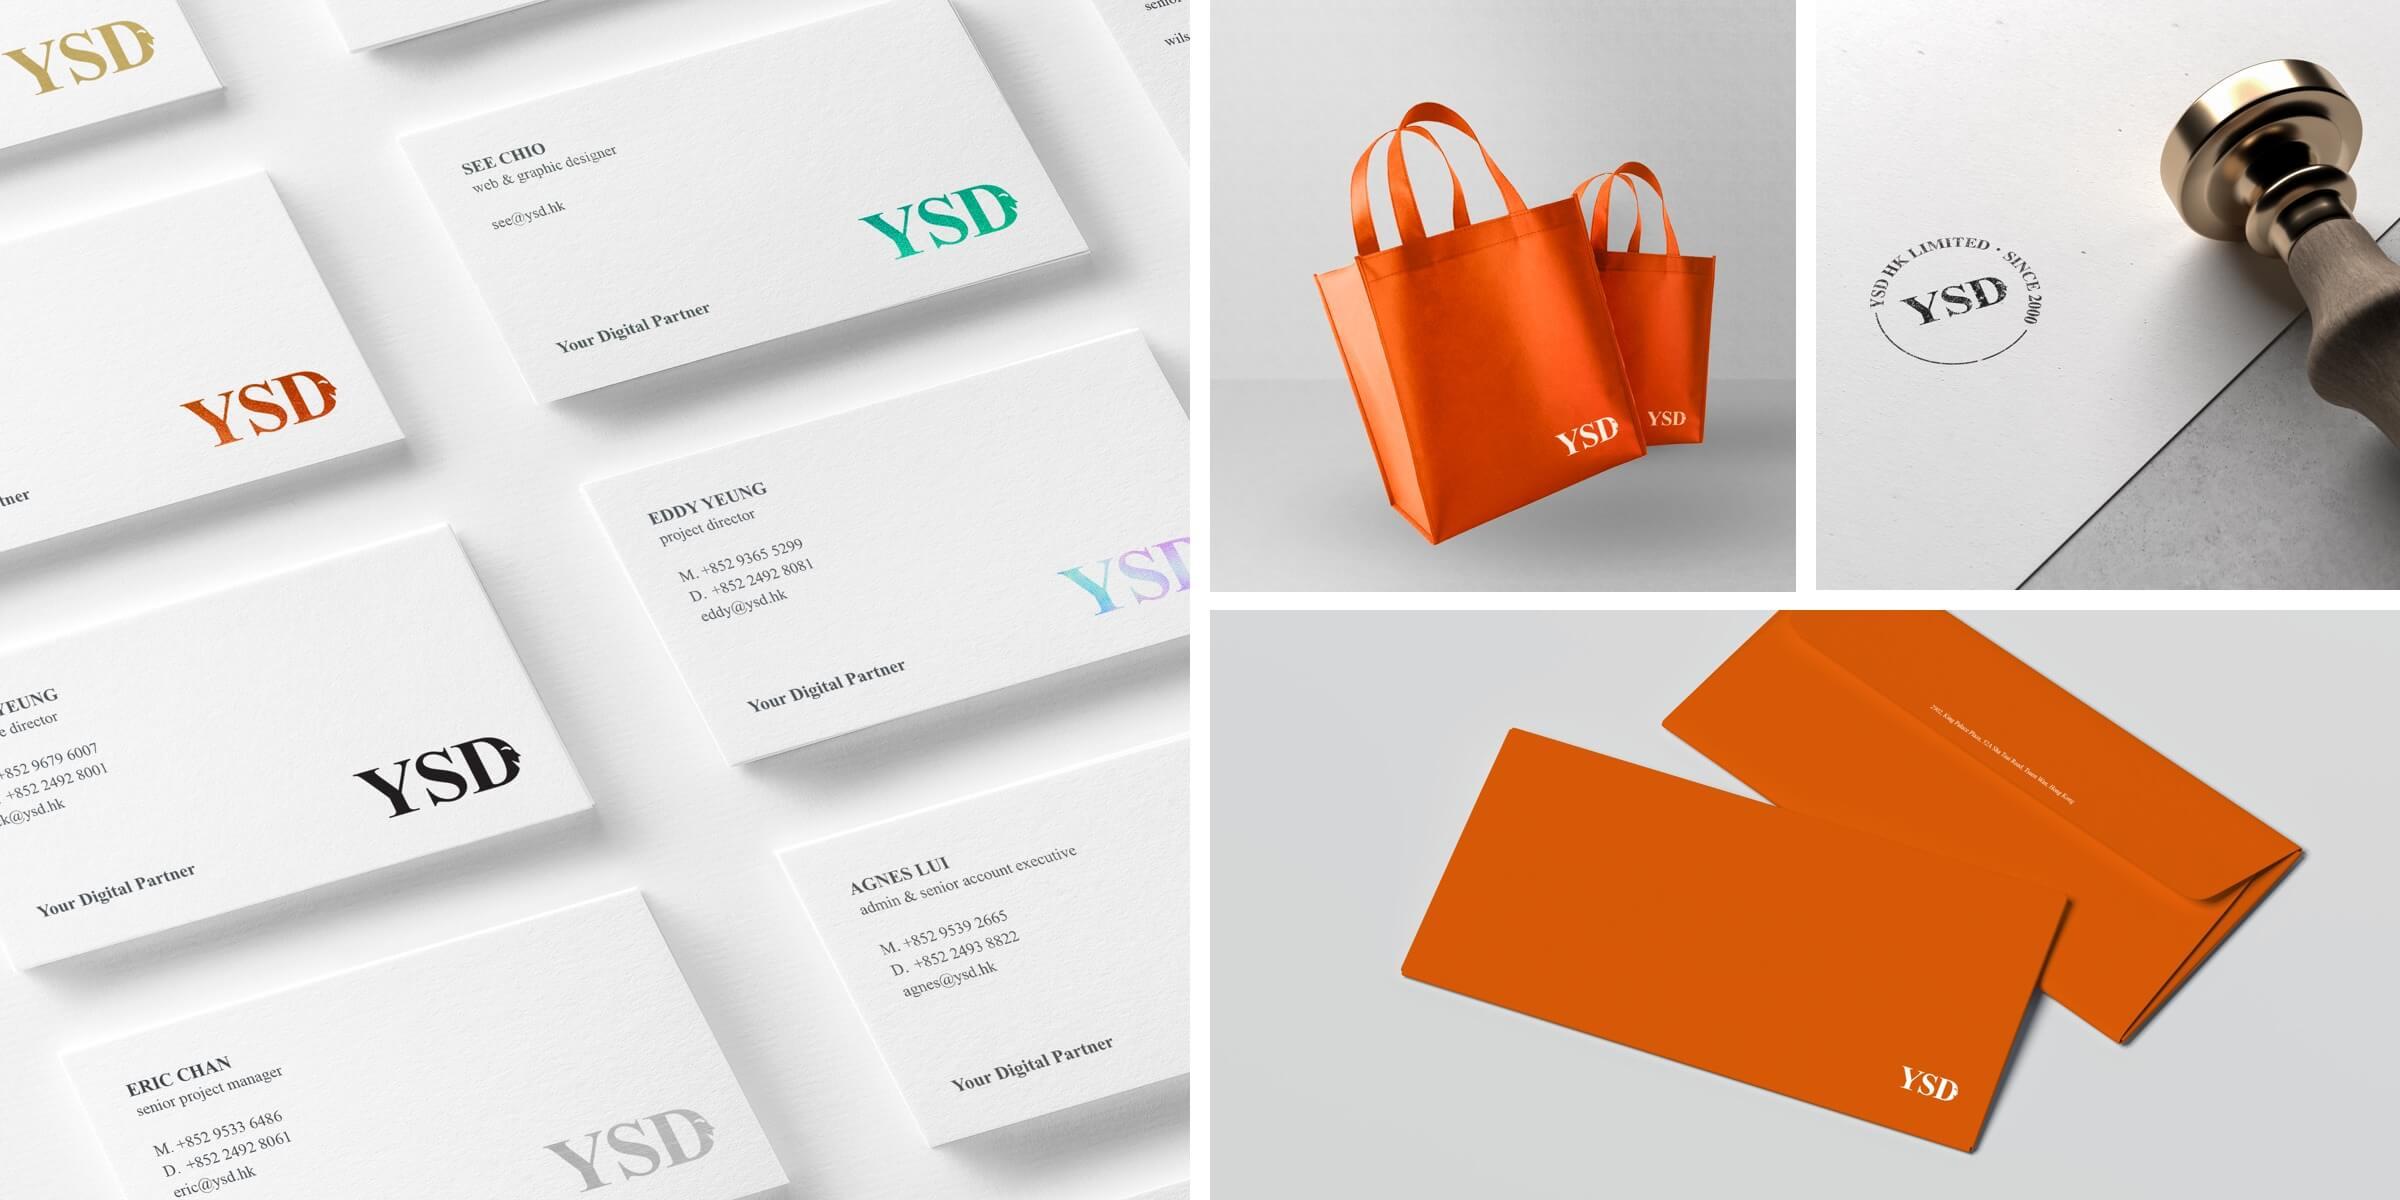 about-branding@2x.jpg